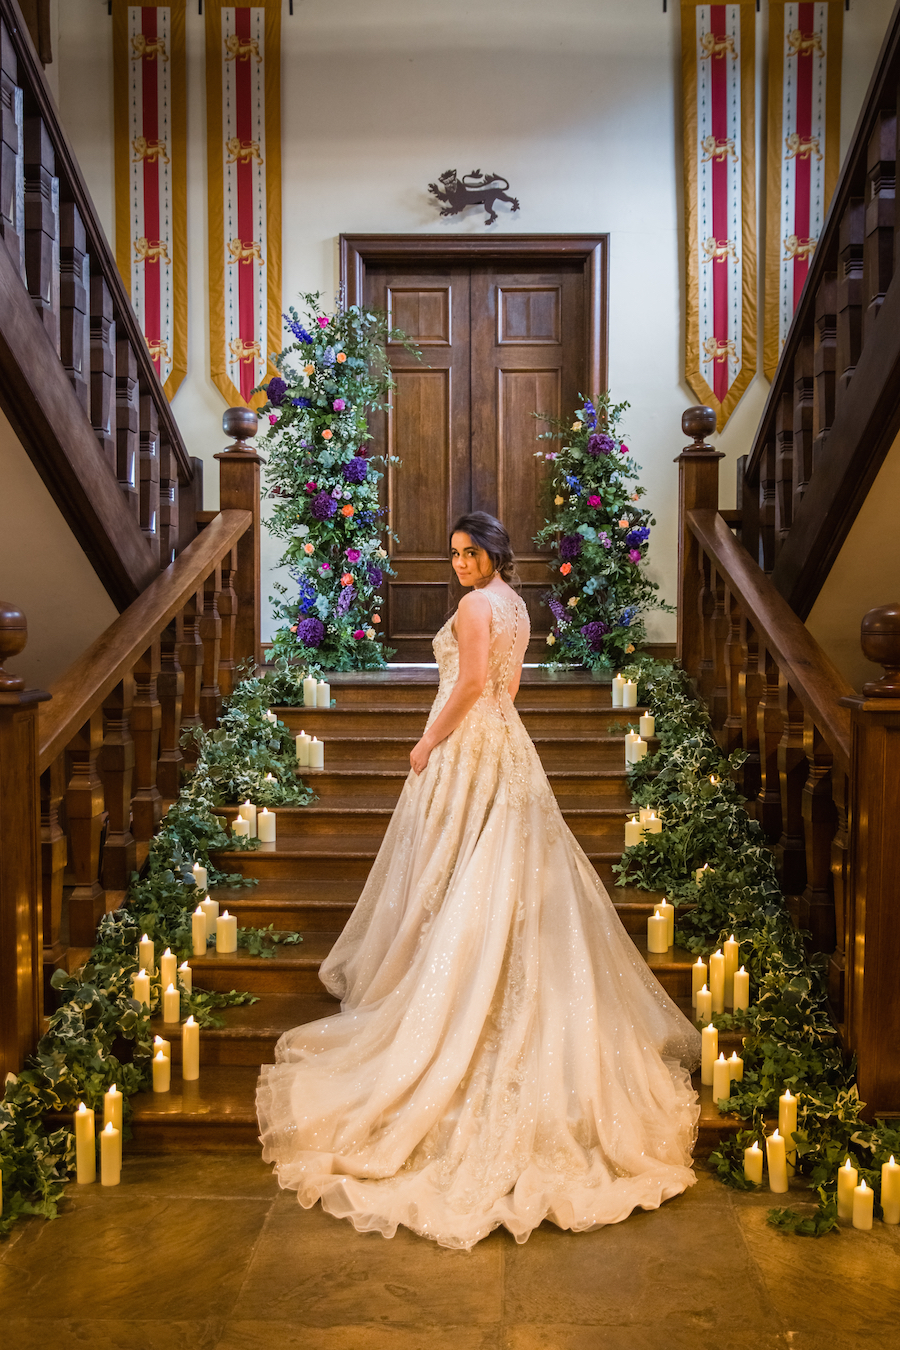 Jewel toned autumn wedding vibes from Layer Marney, image credit Ayshea Goldberg Photography (39)